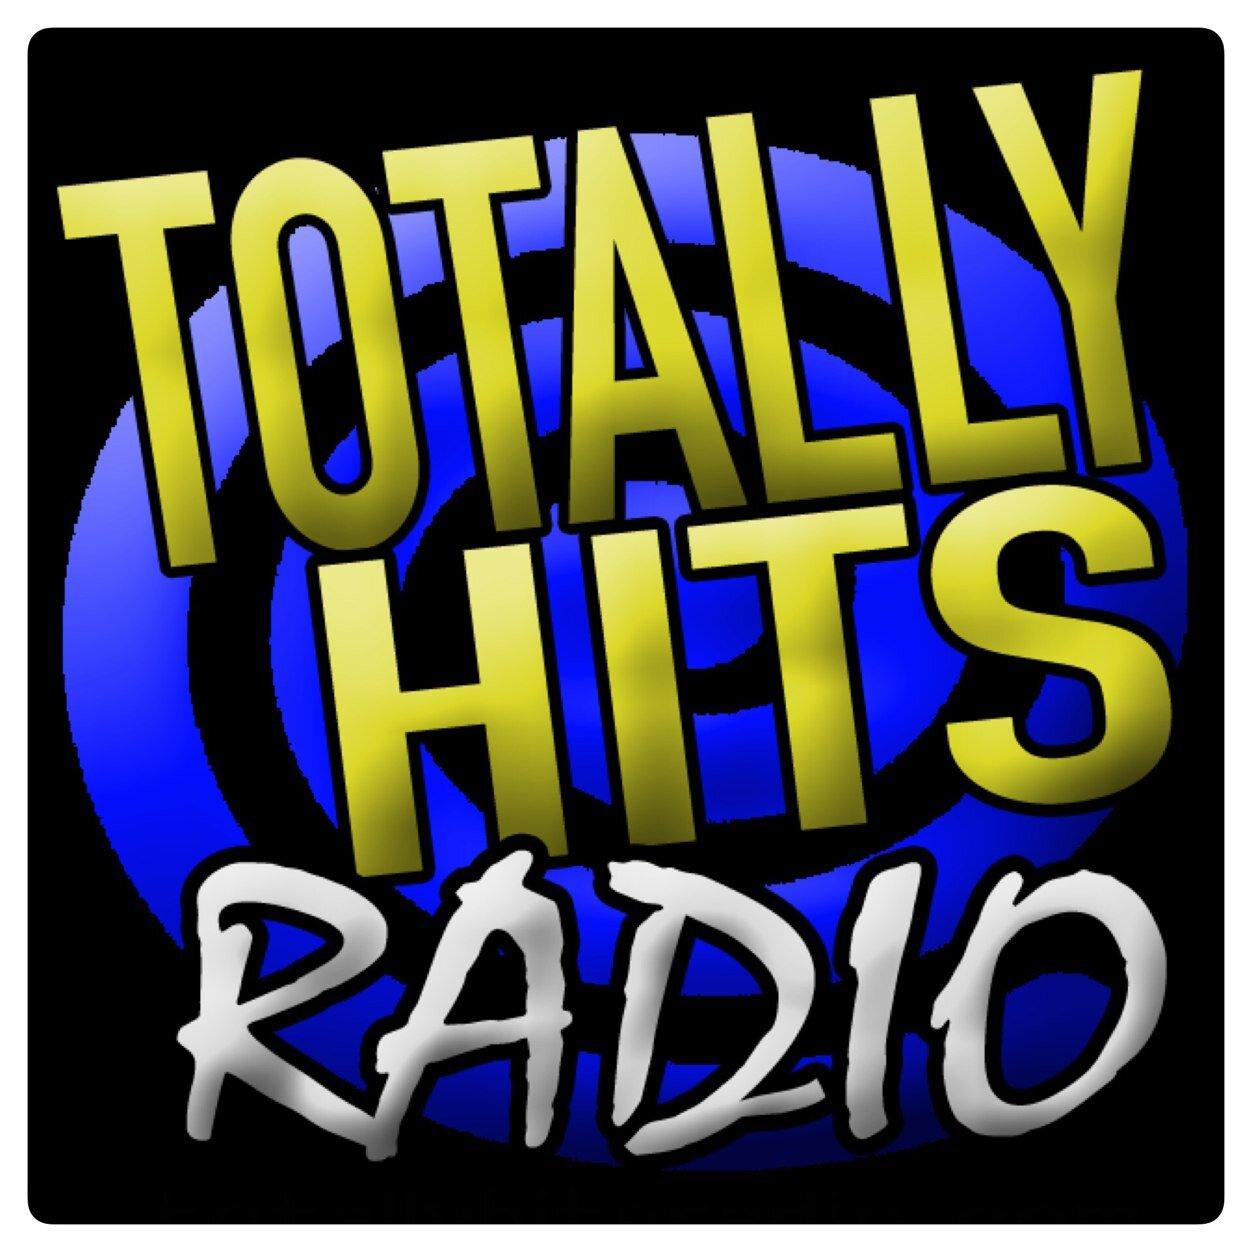 Totally Hits Radio Logo